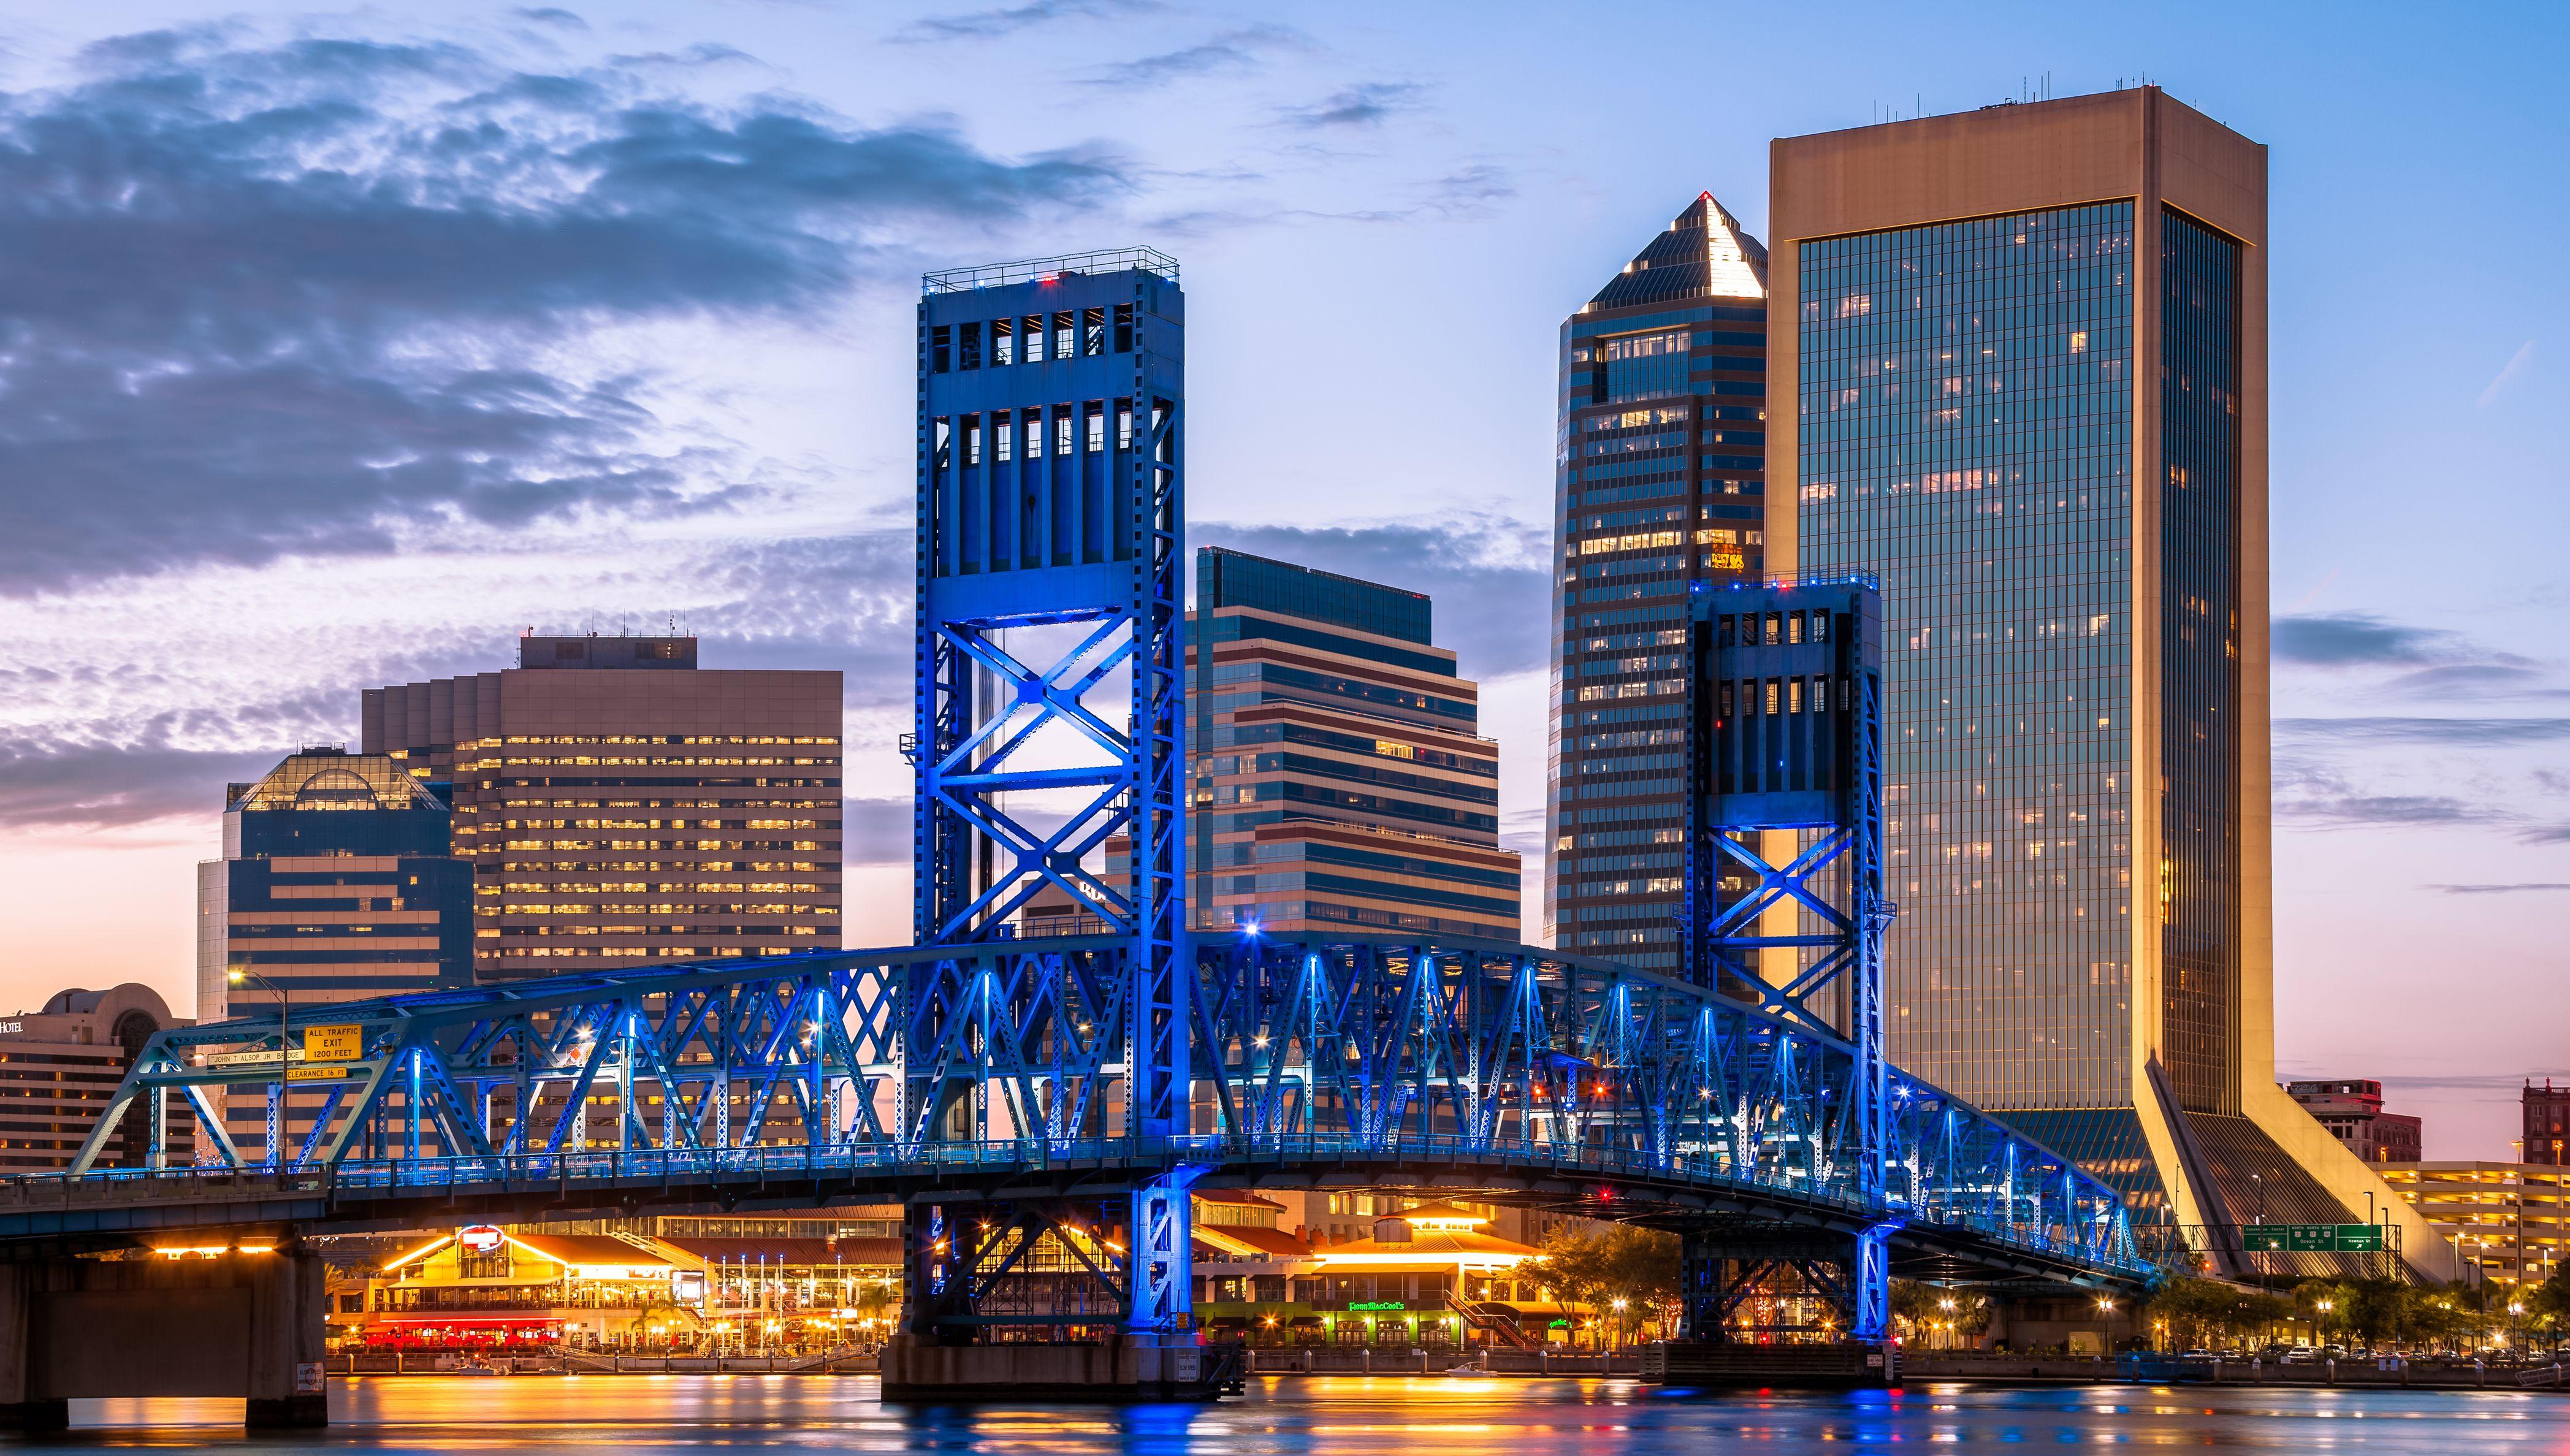 Jacksonville Main Street Bridge at Night